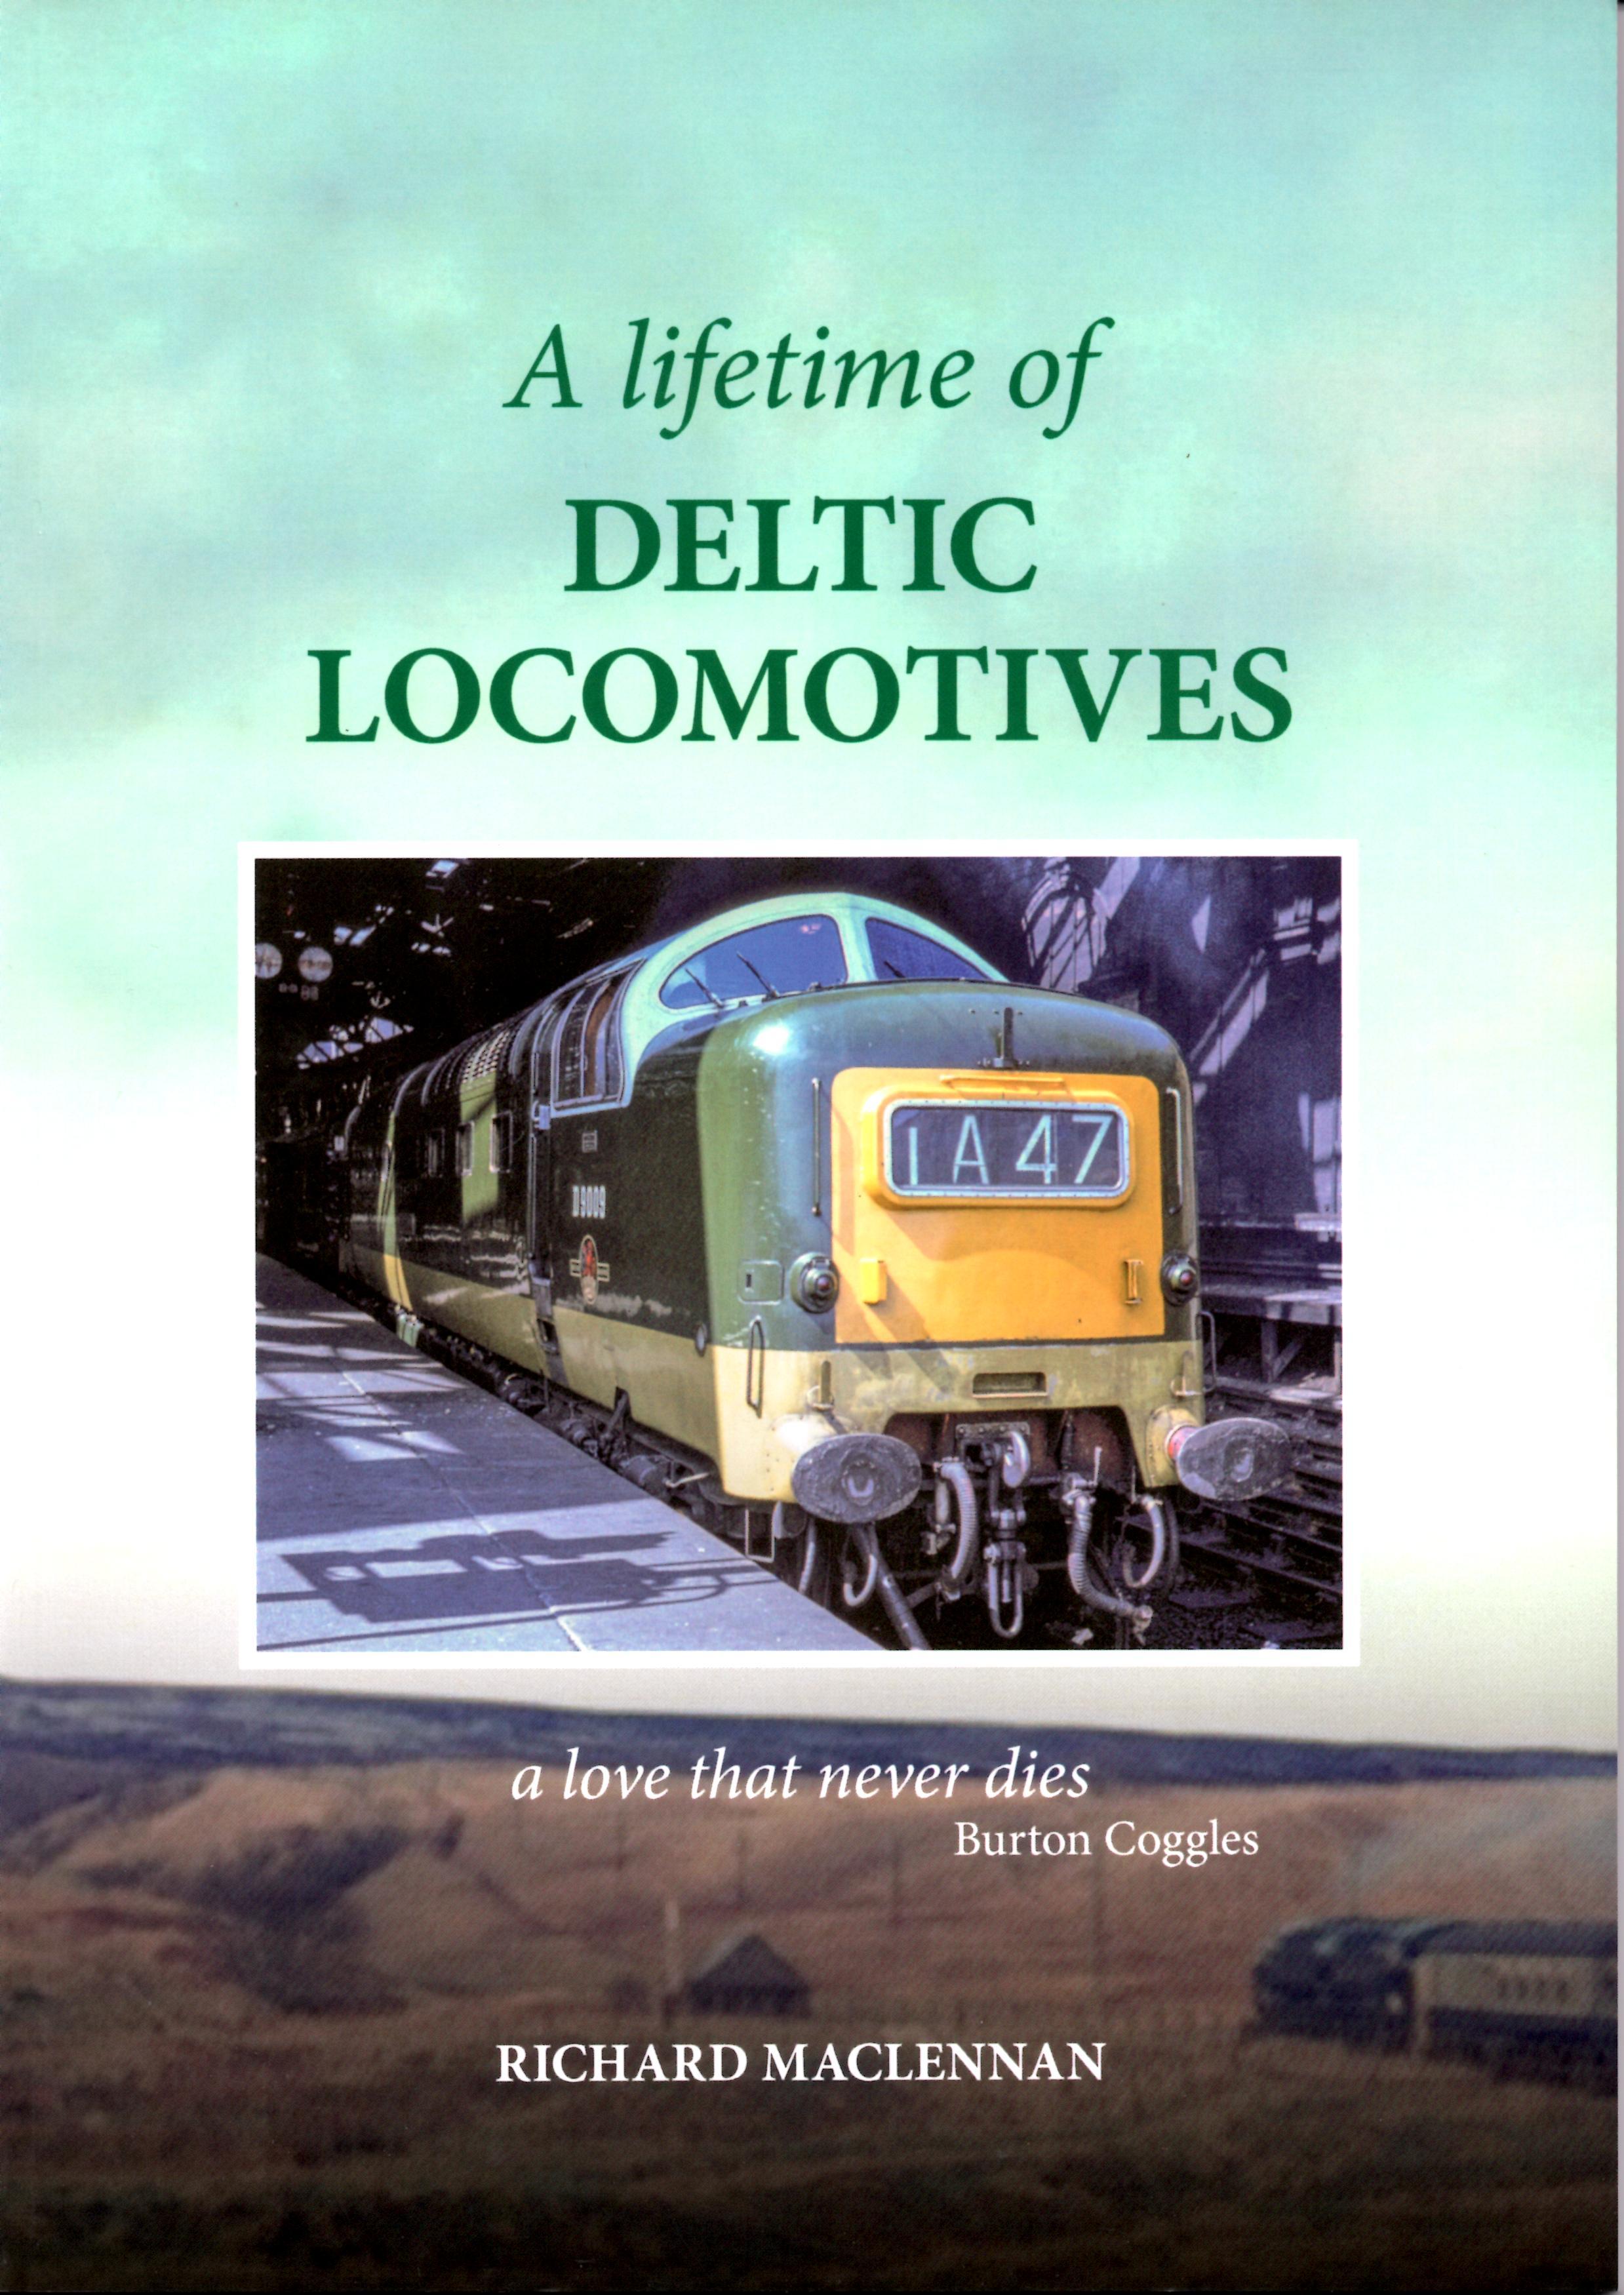 A Lifetime of Deltic Locomotives